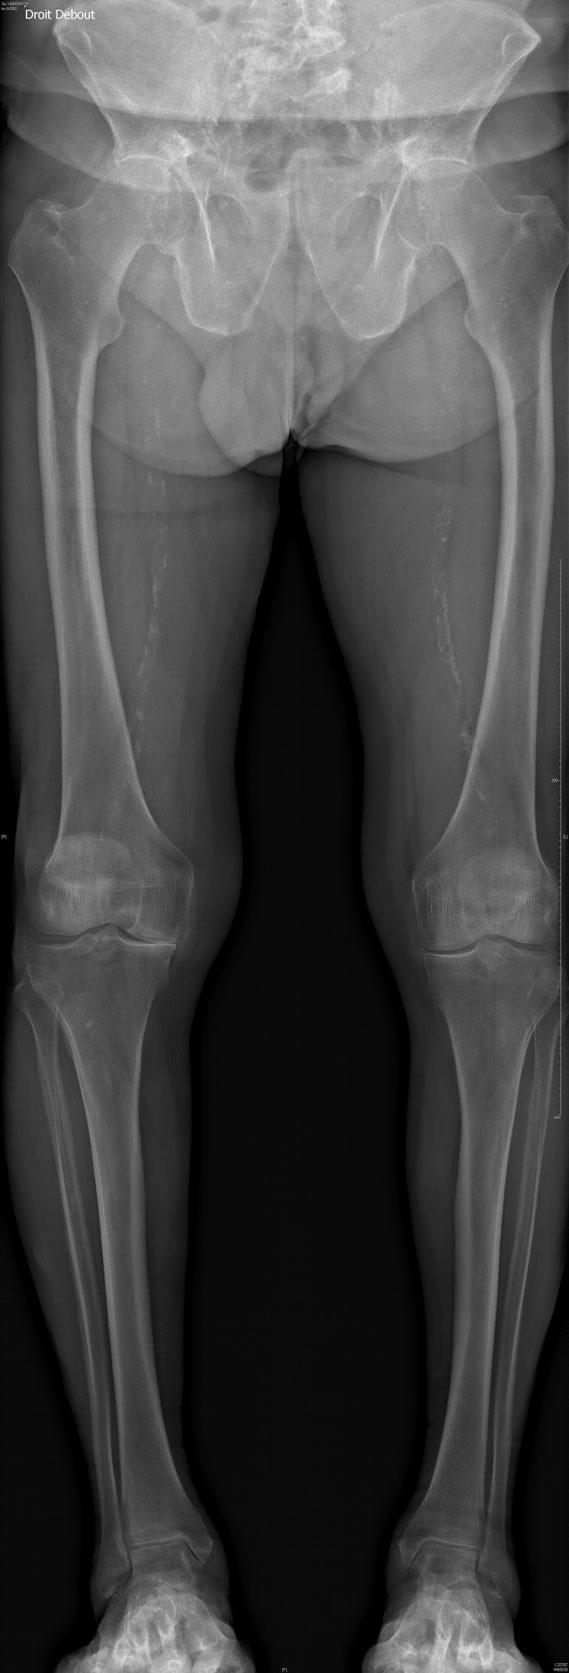 Ostéotomie tibiale de valgisation dr Lozach